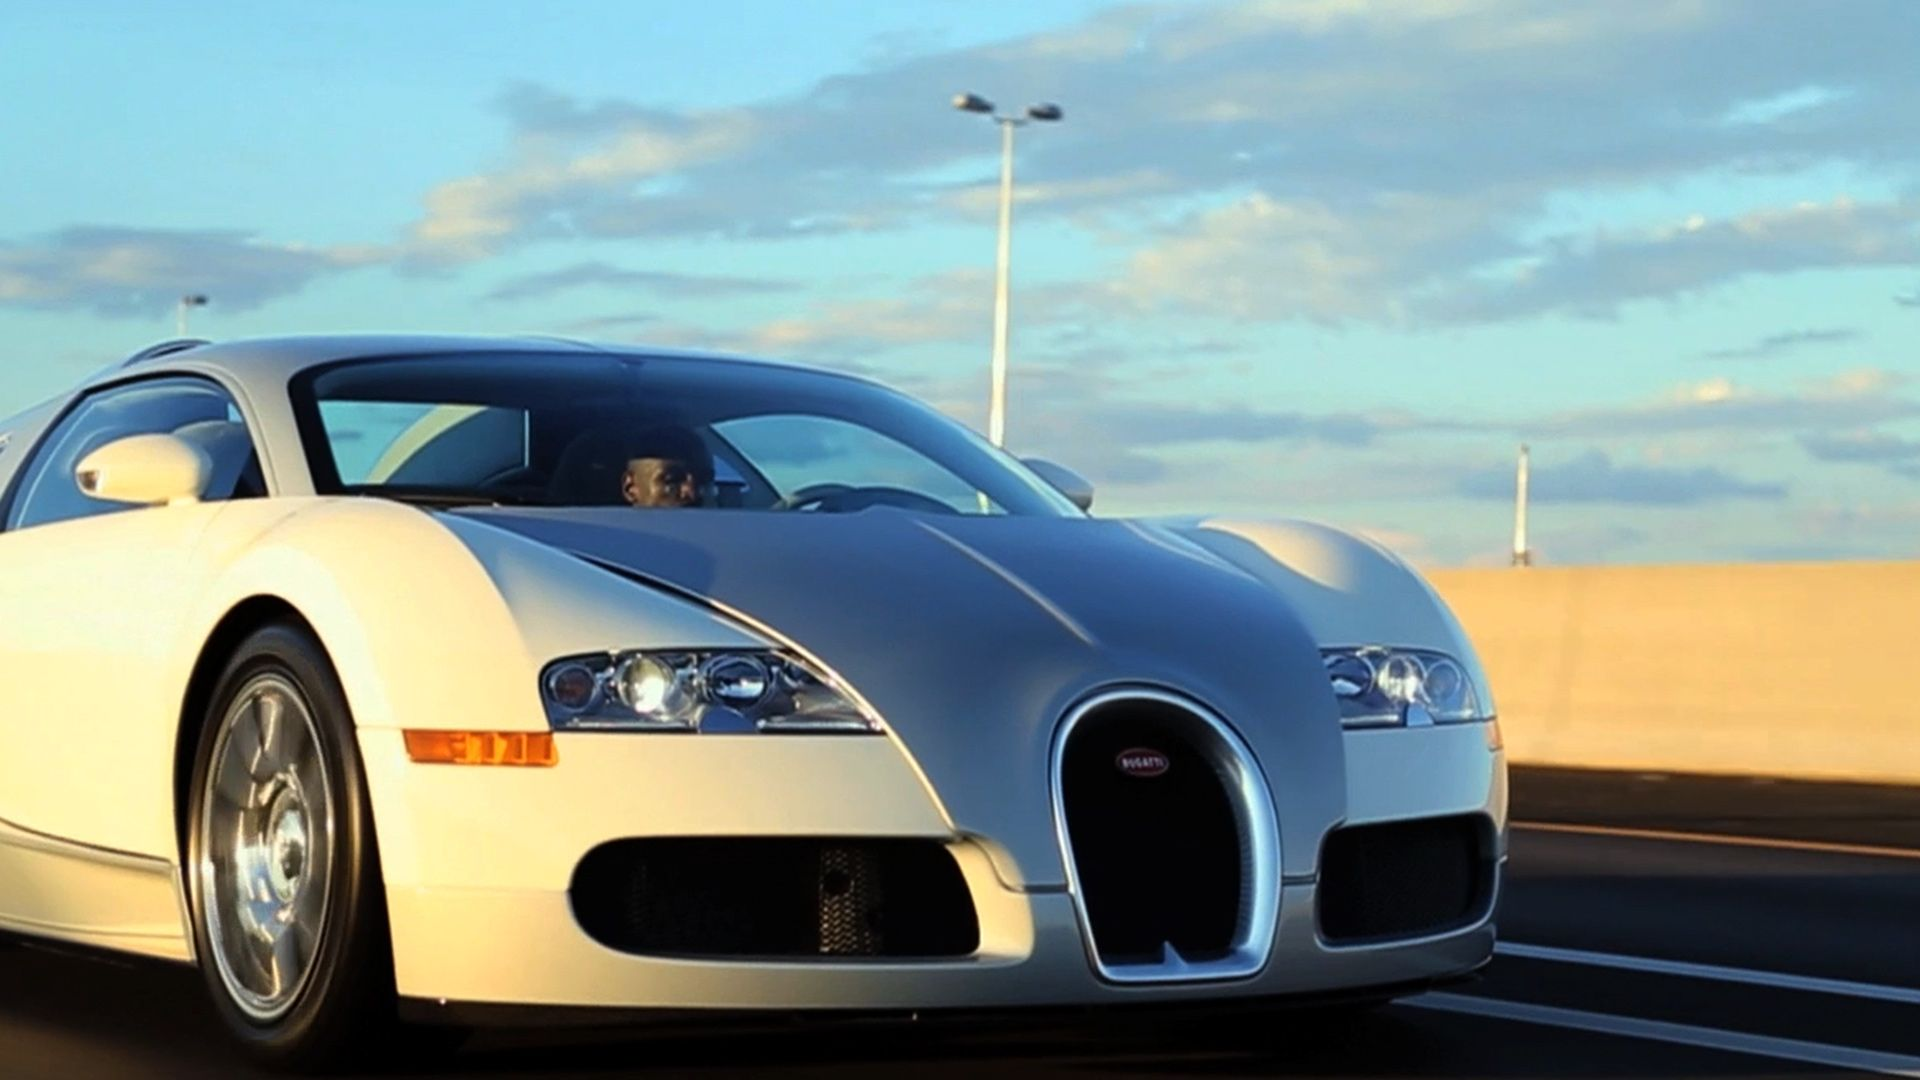 187d47484b4433b924370fe93821cf04 Extraordinary Bugatti Veyron Price List Philippines Cars Trend